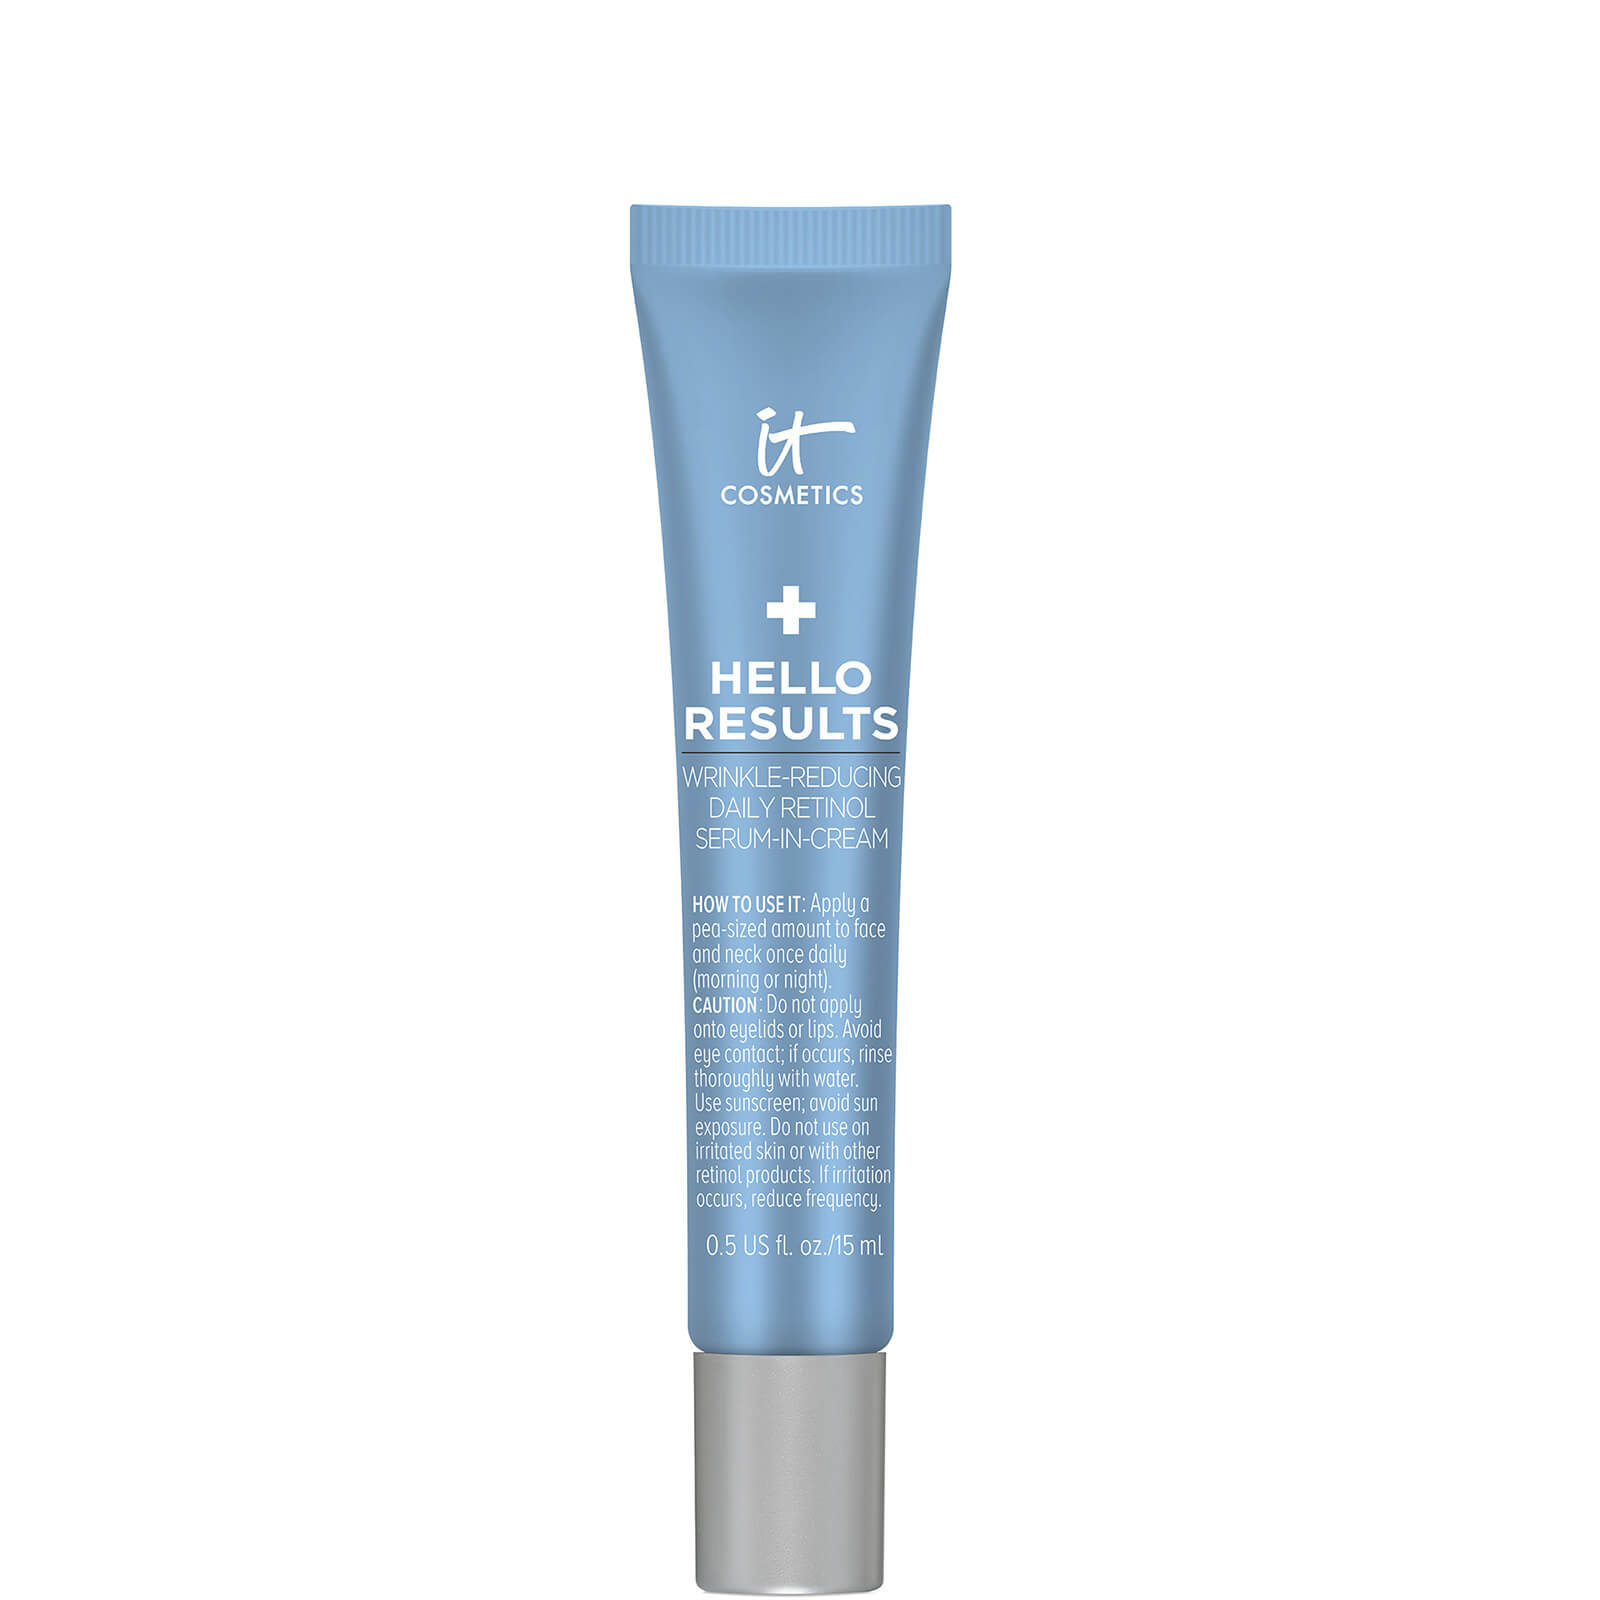 IT Cosmetics Hello Results Wrinkle-Reducing Daily Retinol Cream (Various Sizes) - 15ml